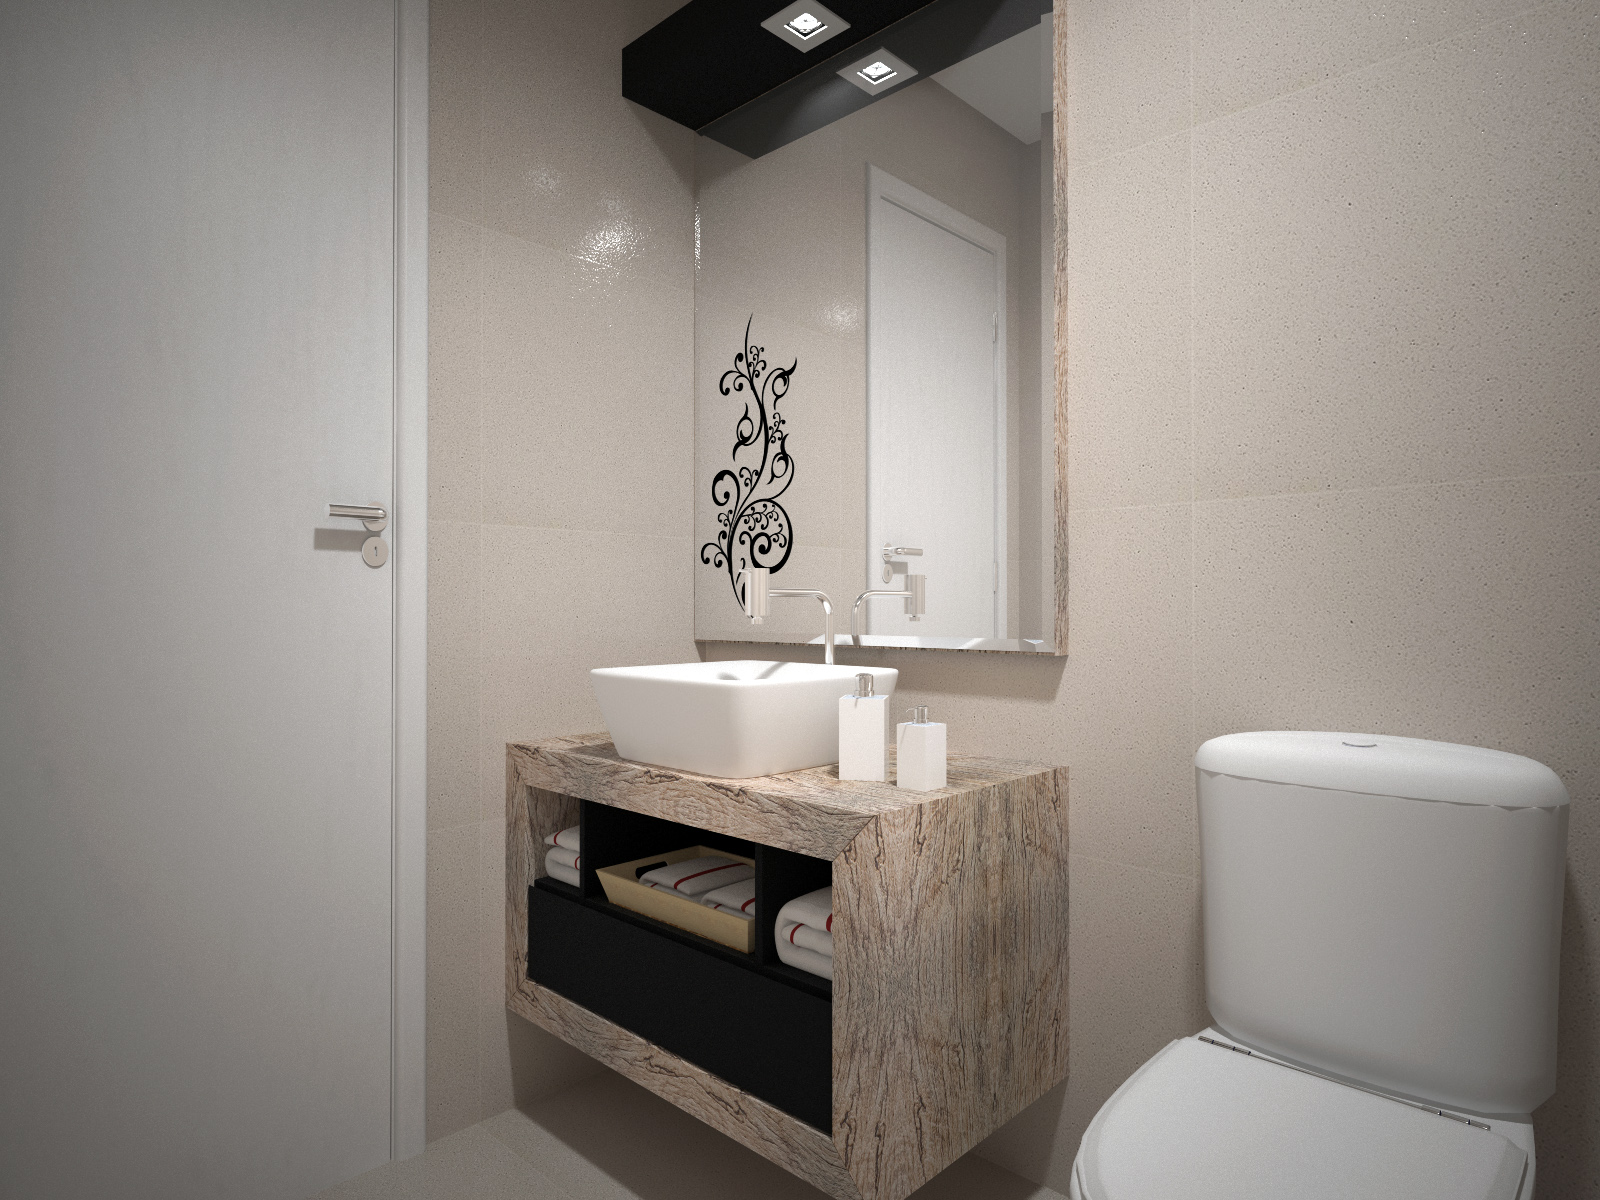 Banheiro Vintage e Laka preta #675B50 1600 1200